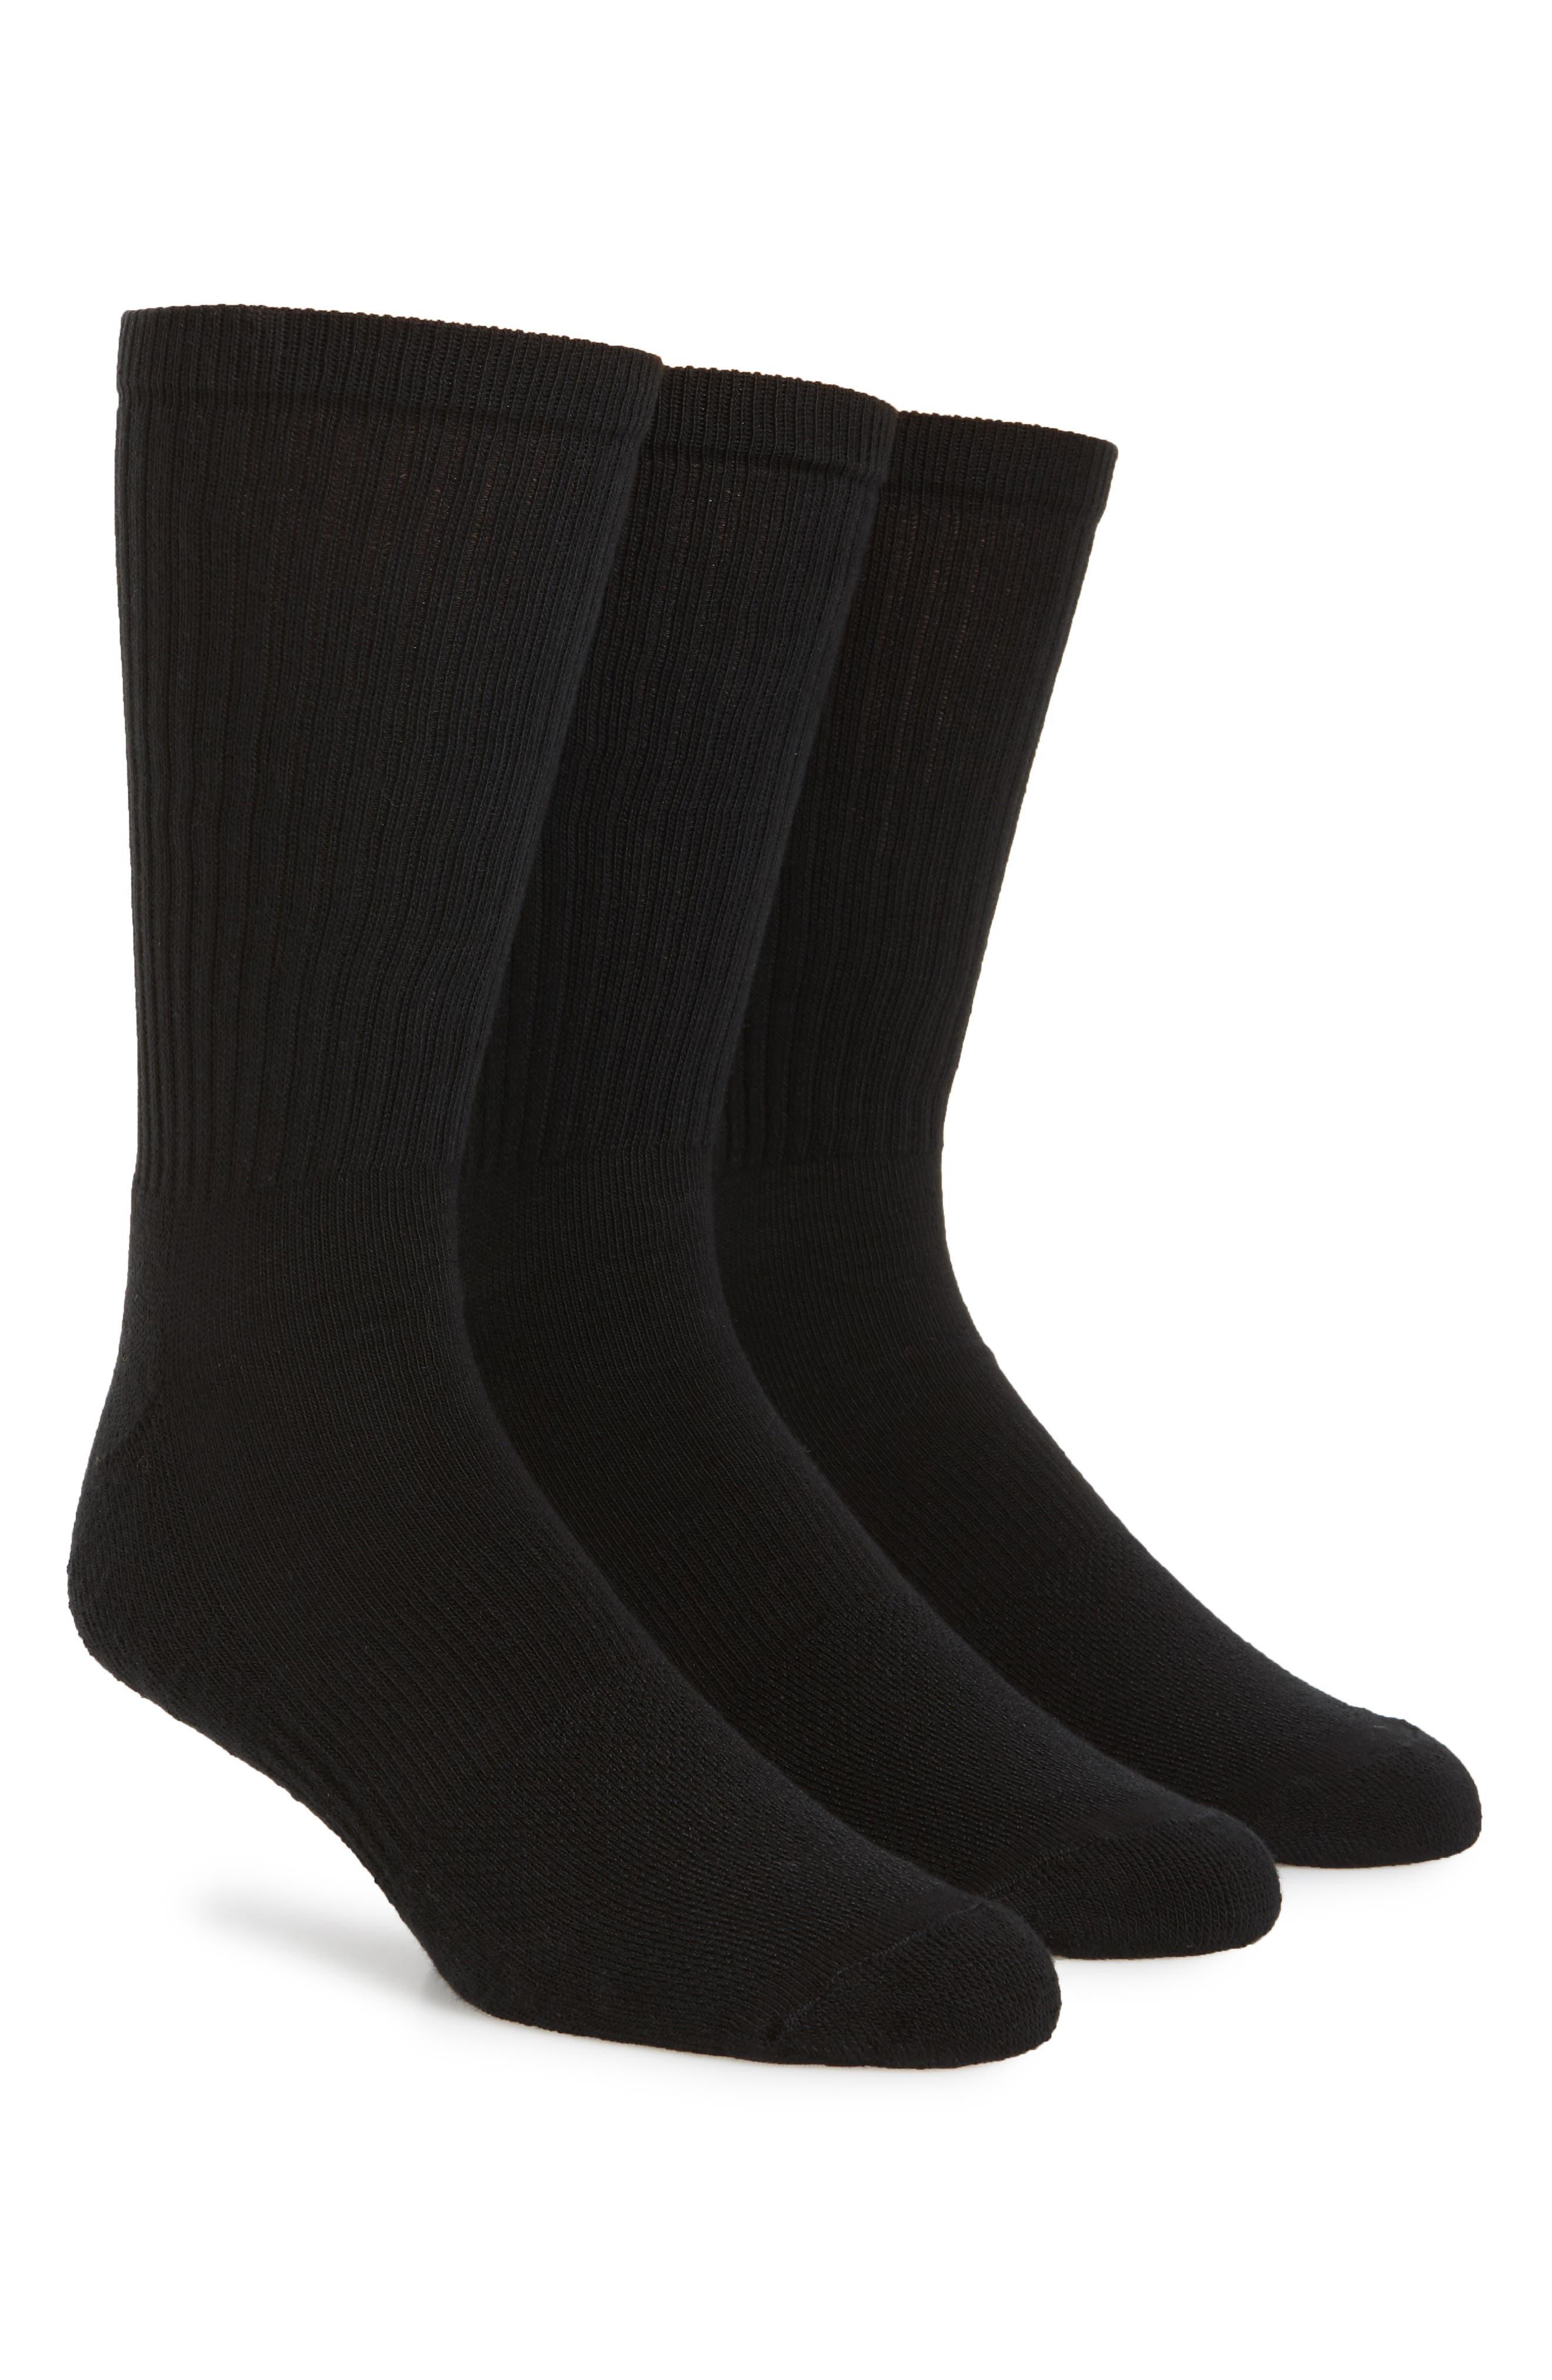 3-Pack Crew Cut Athletic Socks,                         Main,                         color, Black